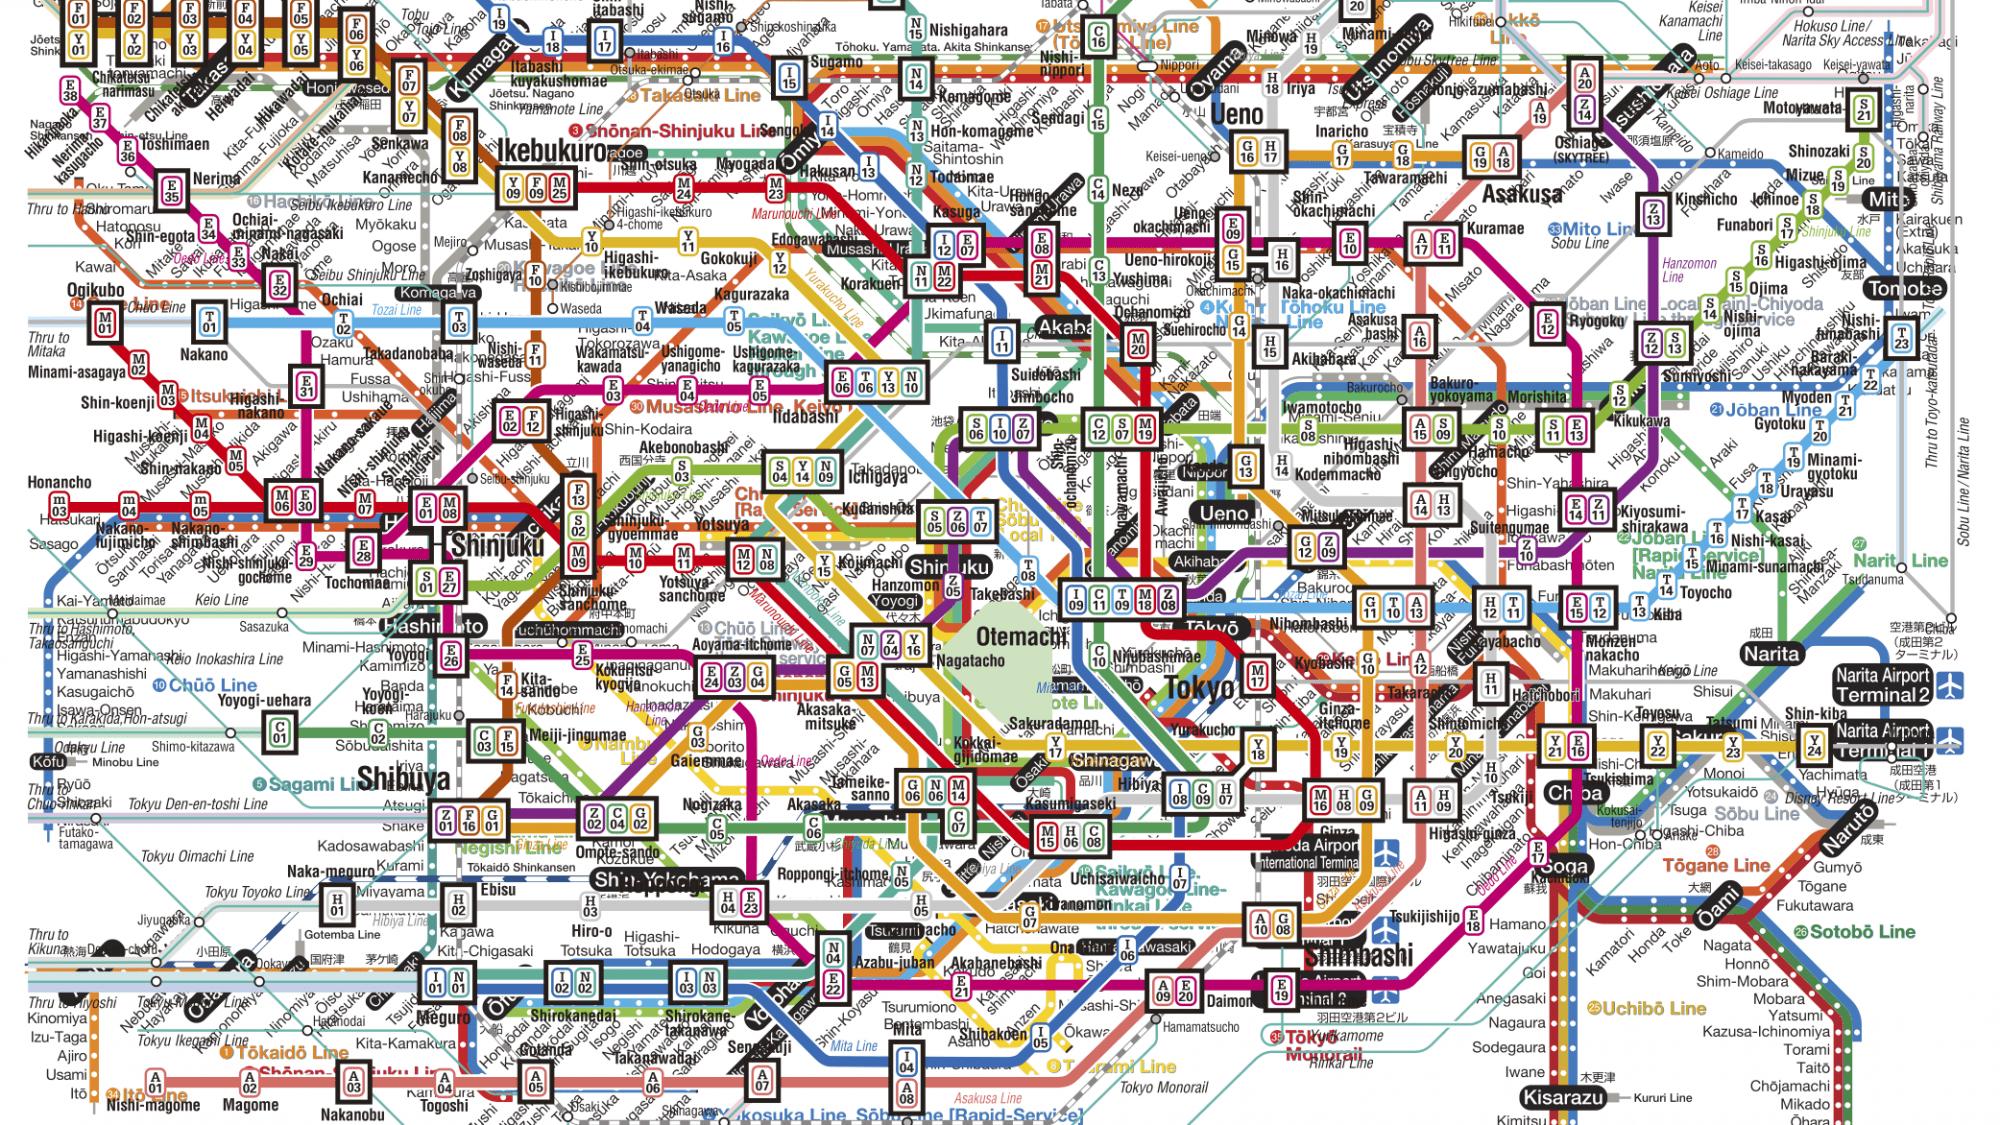 Tokyo Subway Maps.Inbetween The Lines Of Tokyo S Jr Metro Maps Randomwire